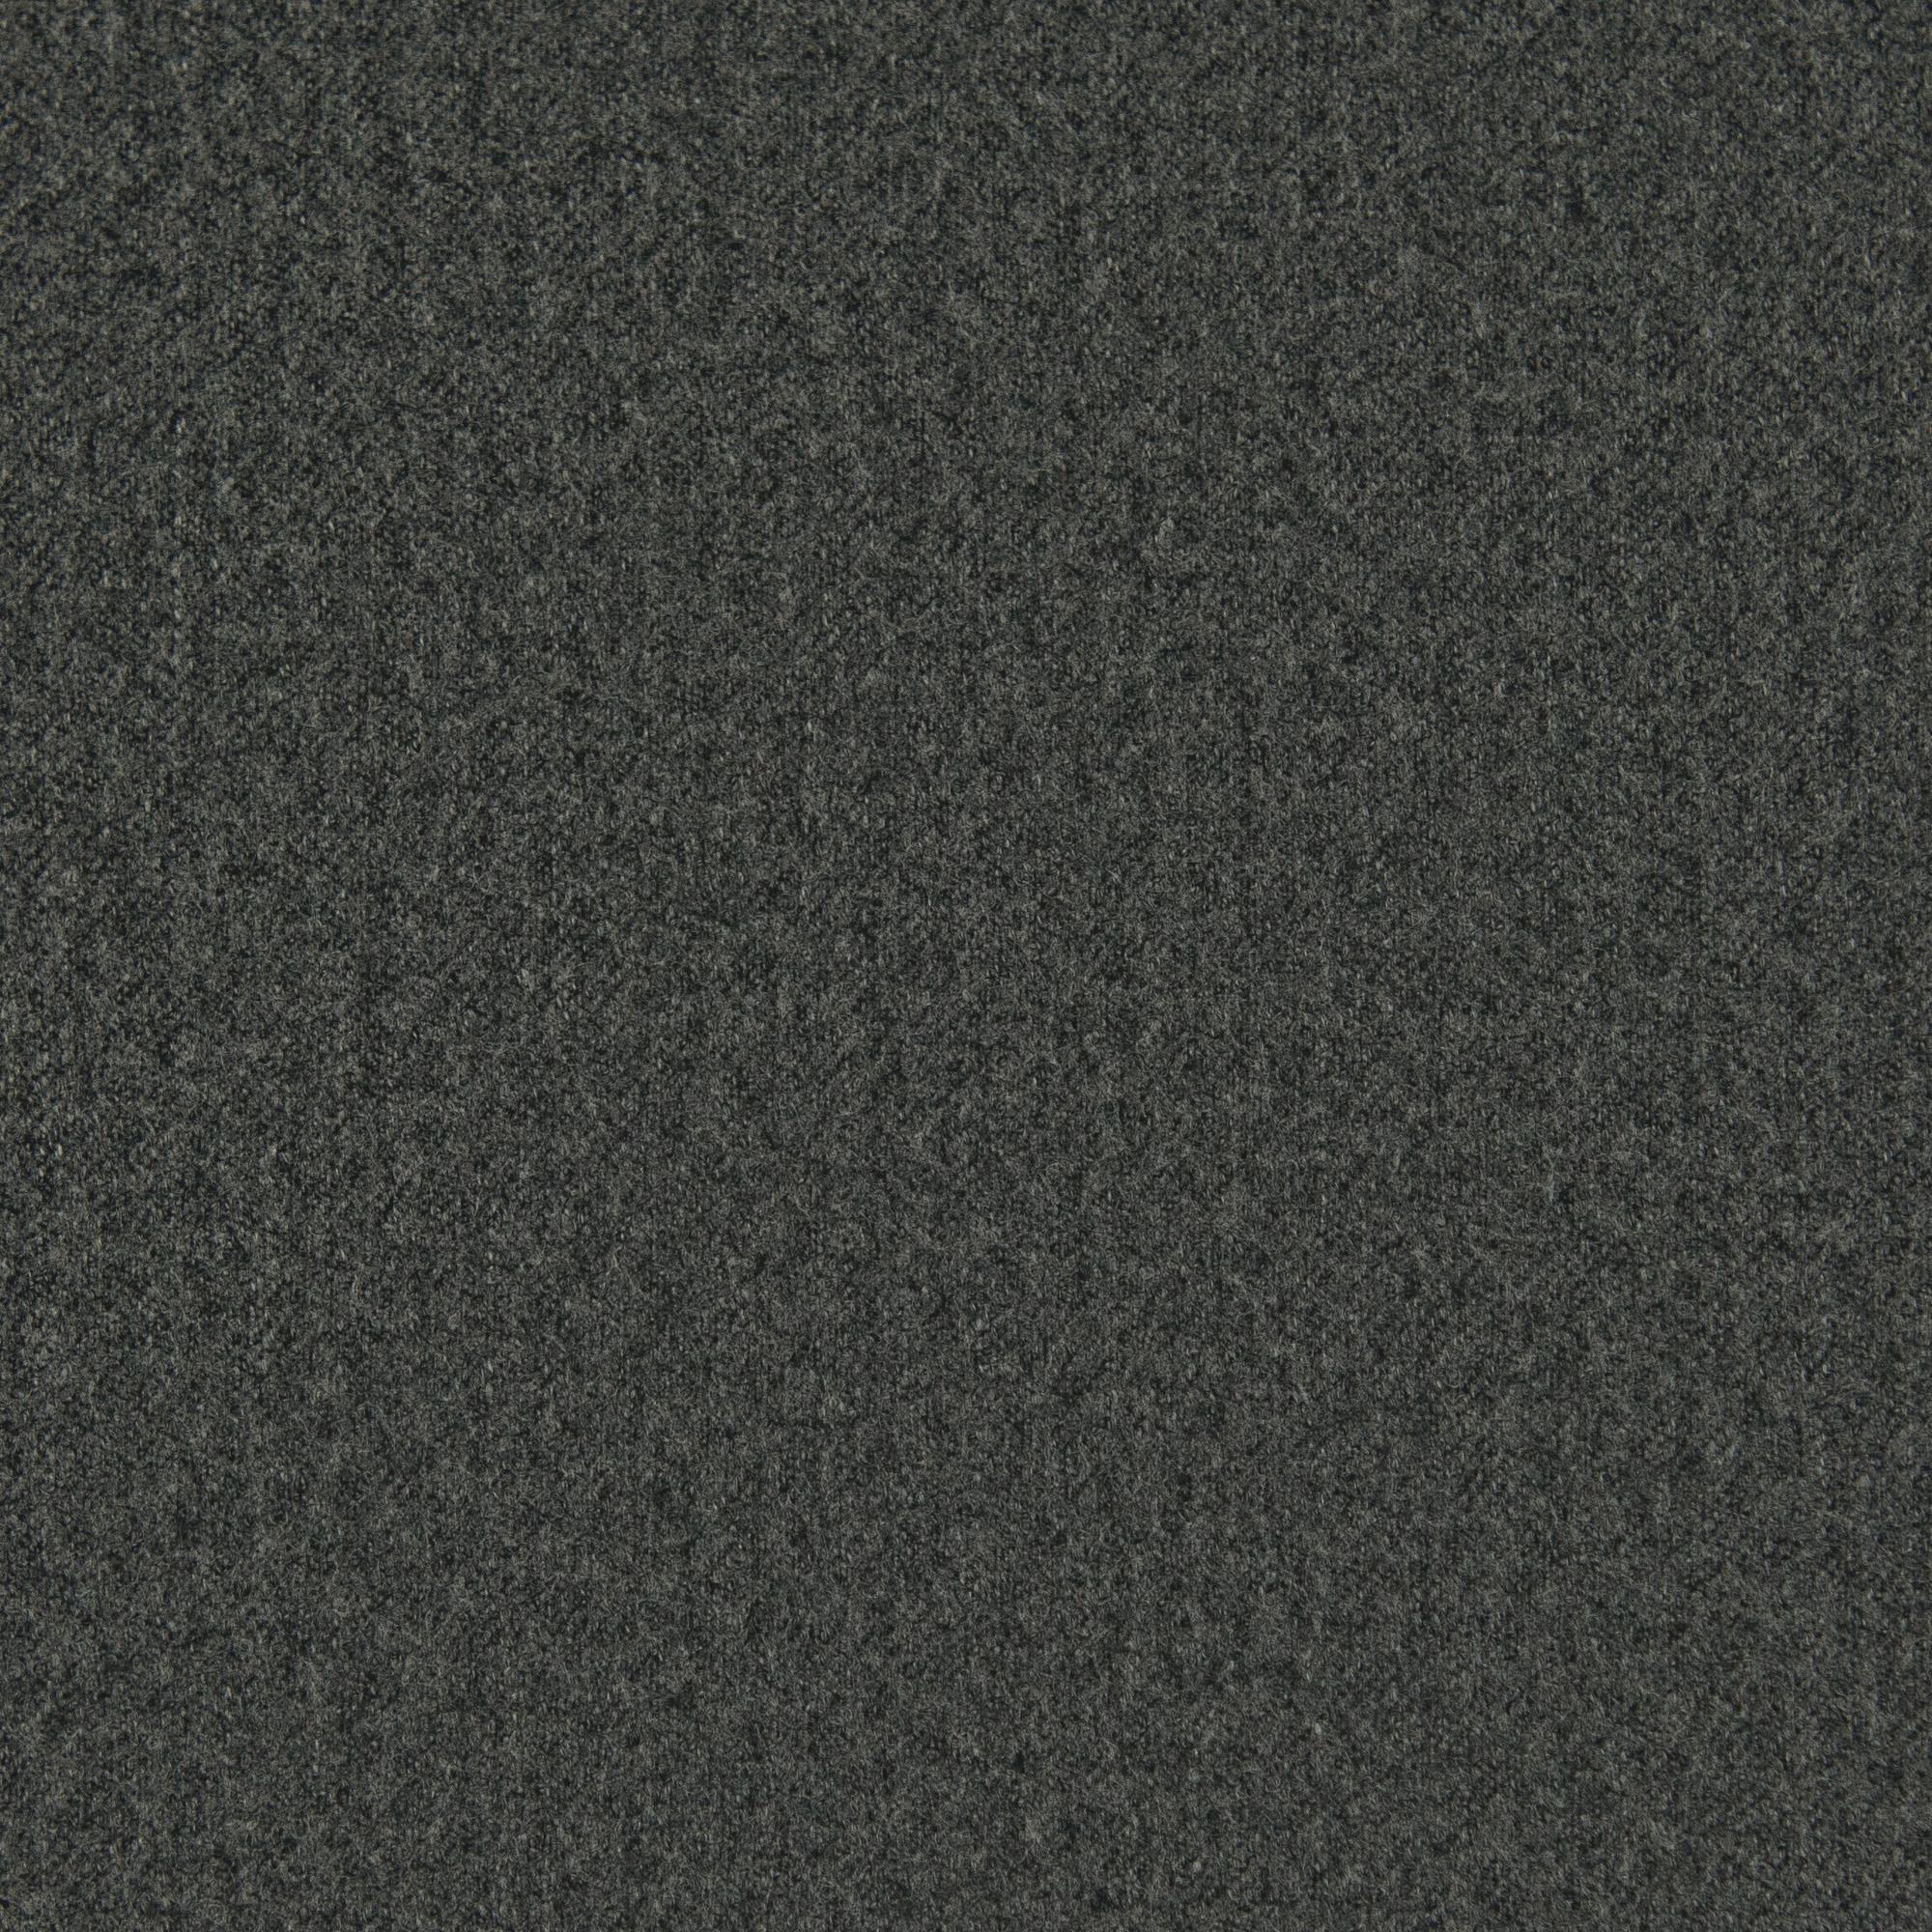 Sz1713009 1